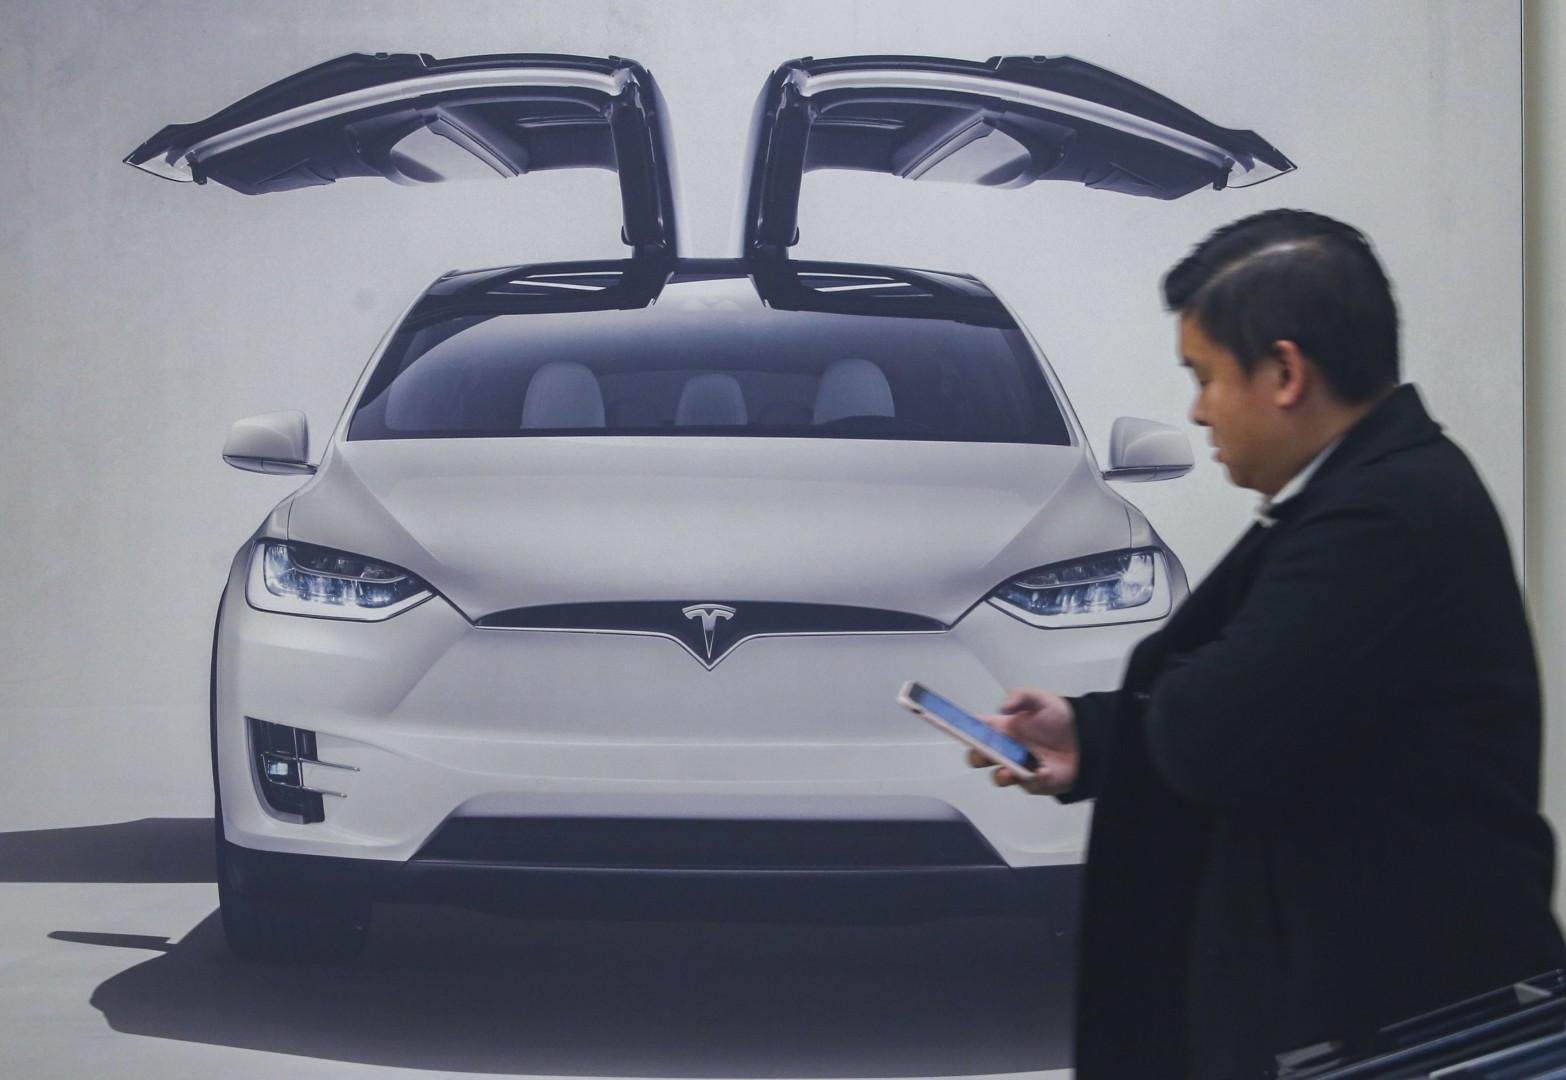 Will Tesla lose its cool in Hong Kong? Axa triples insurance